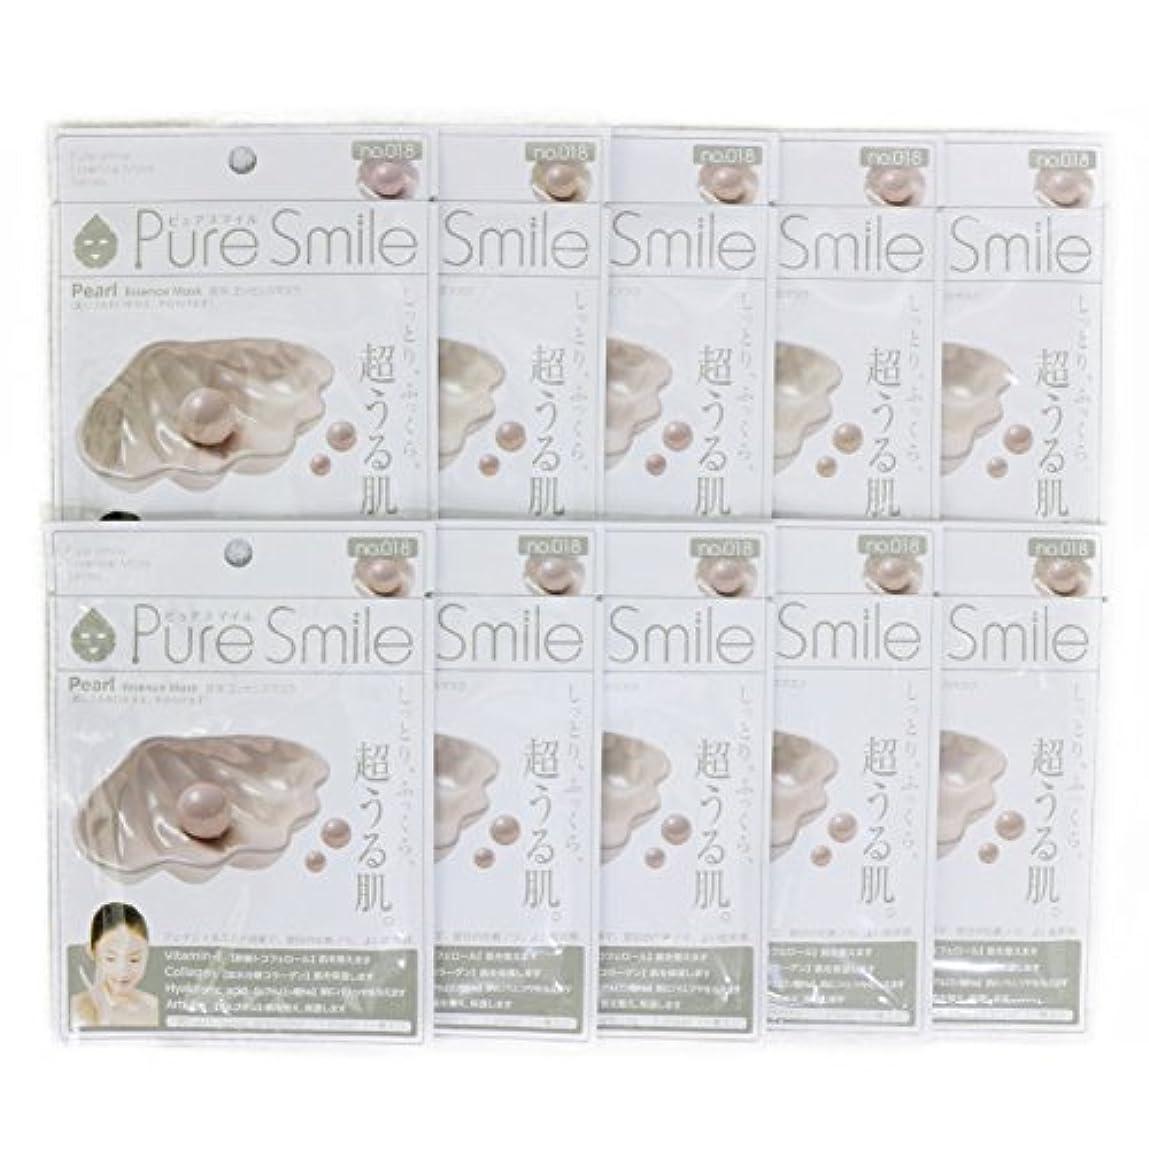 Pure Smile ピュアスマイル エッセンスマスク 真珠 10枚セット